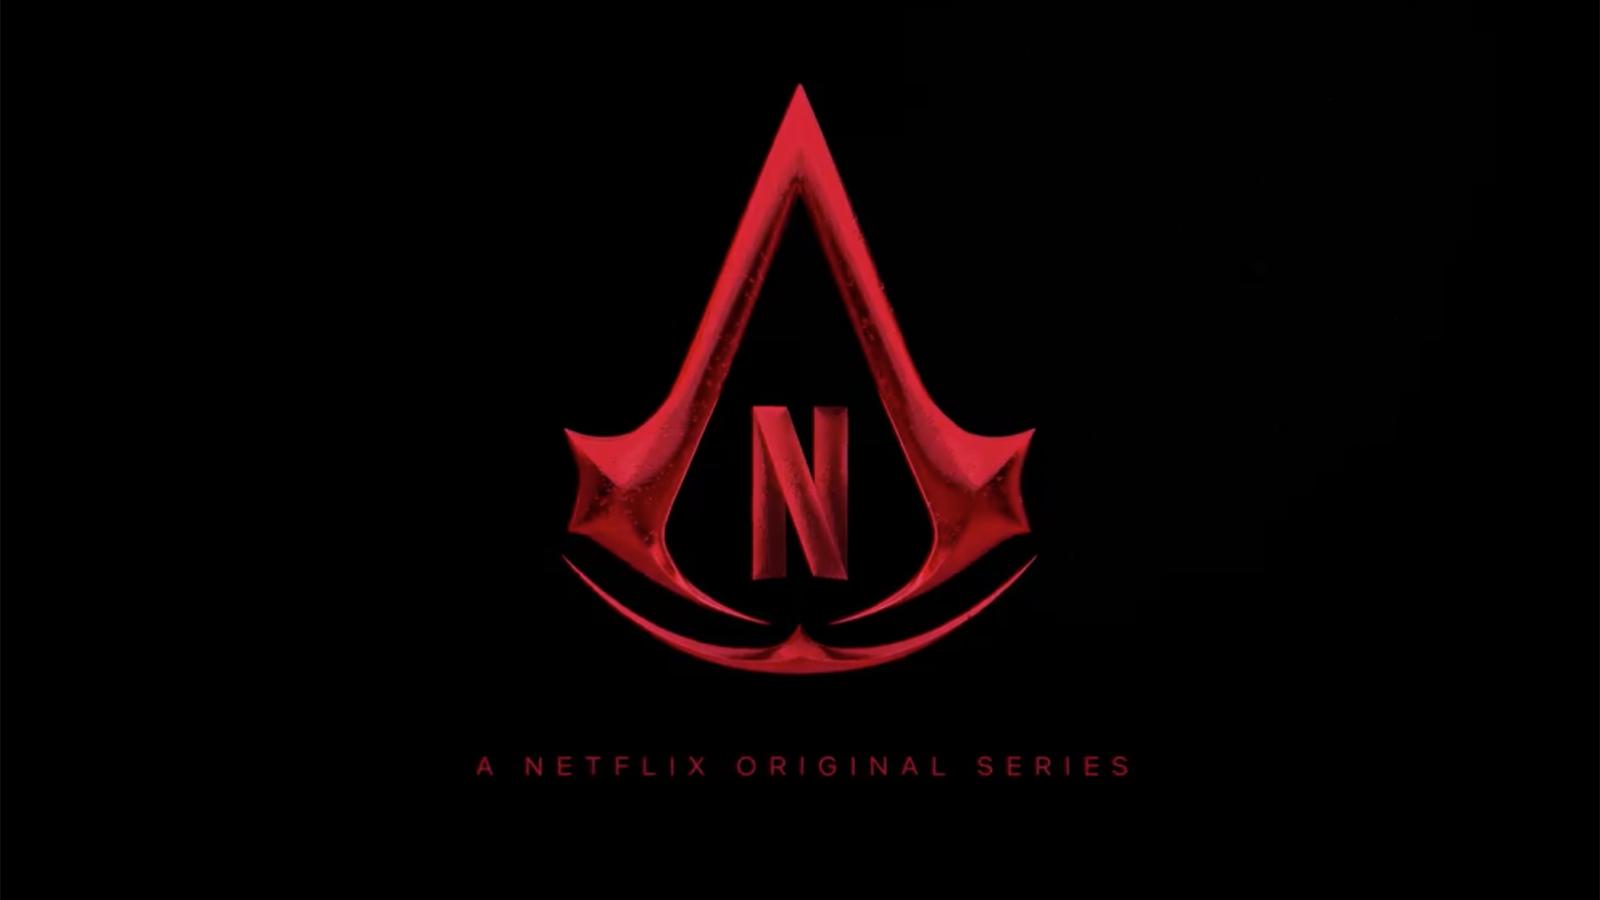 Assassin's Creed Netflix logo